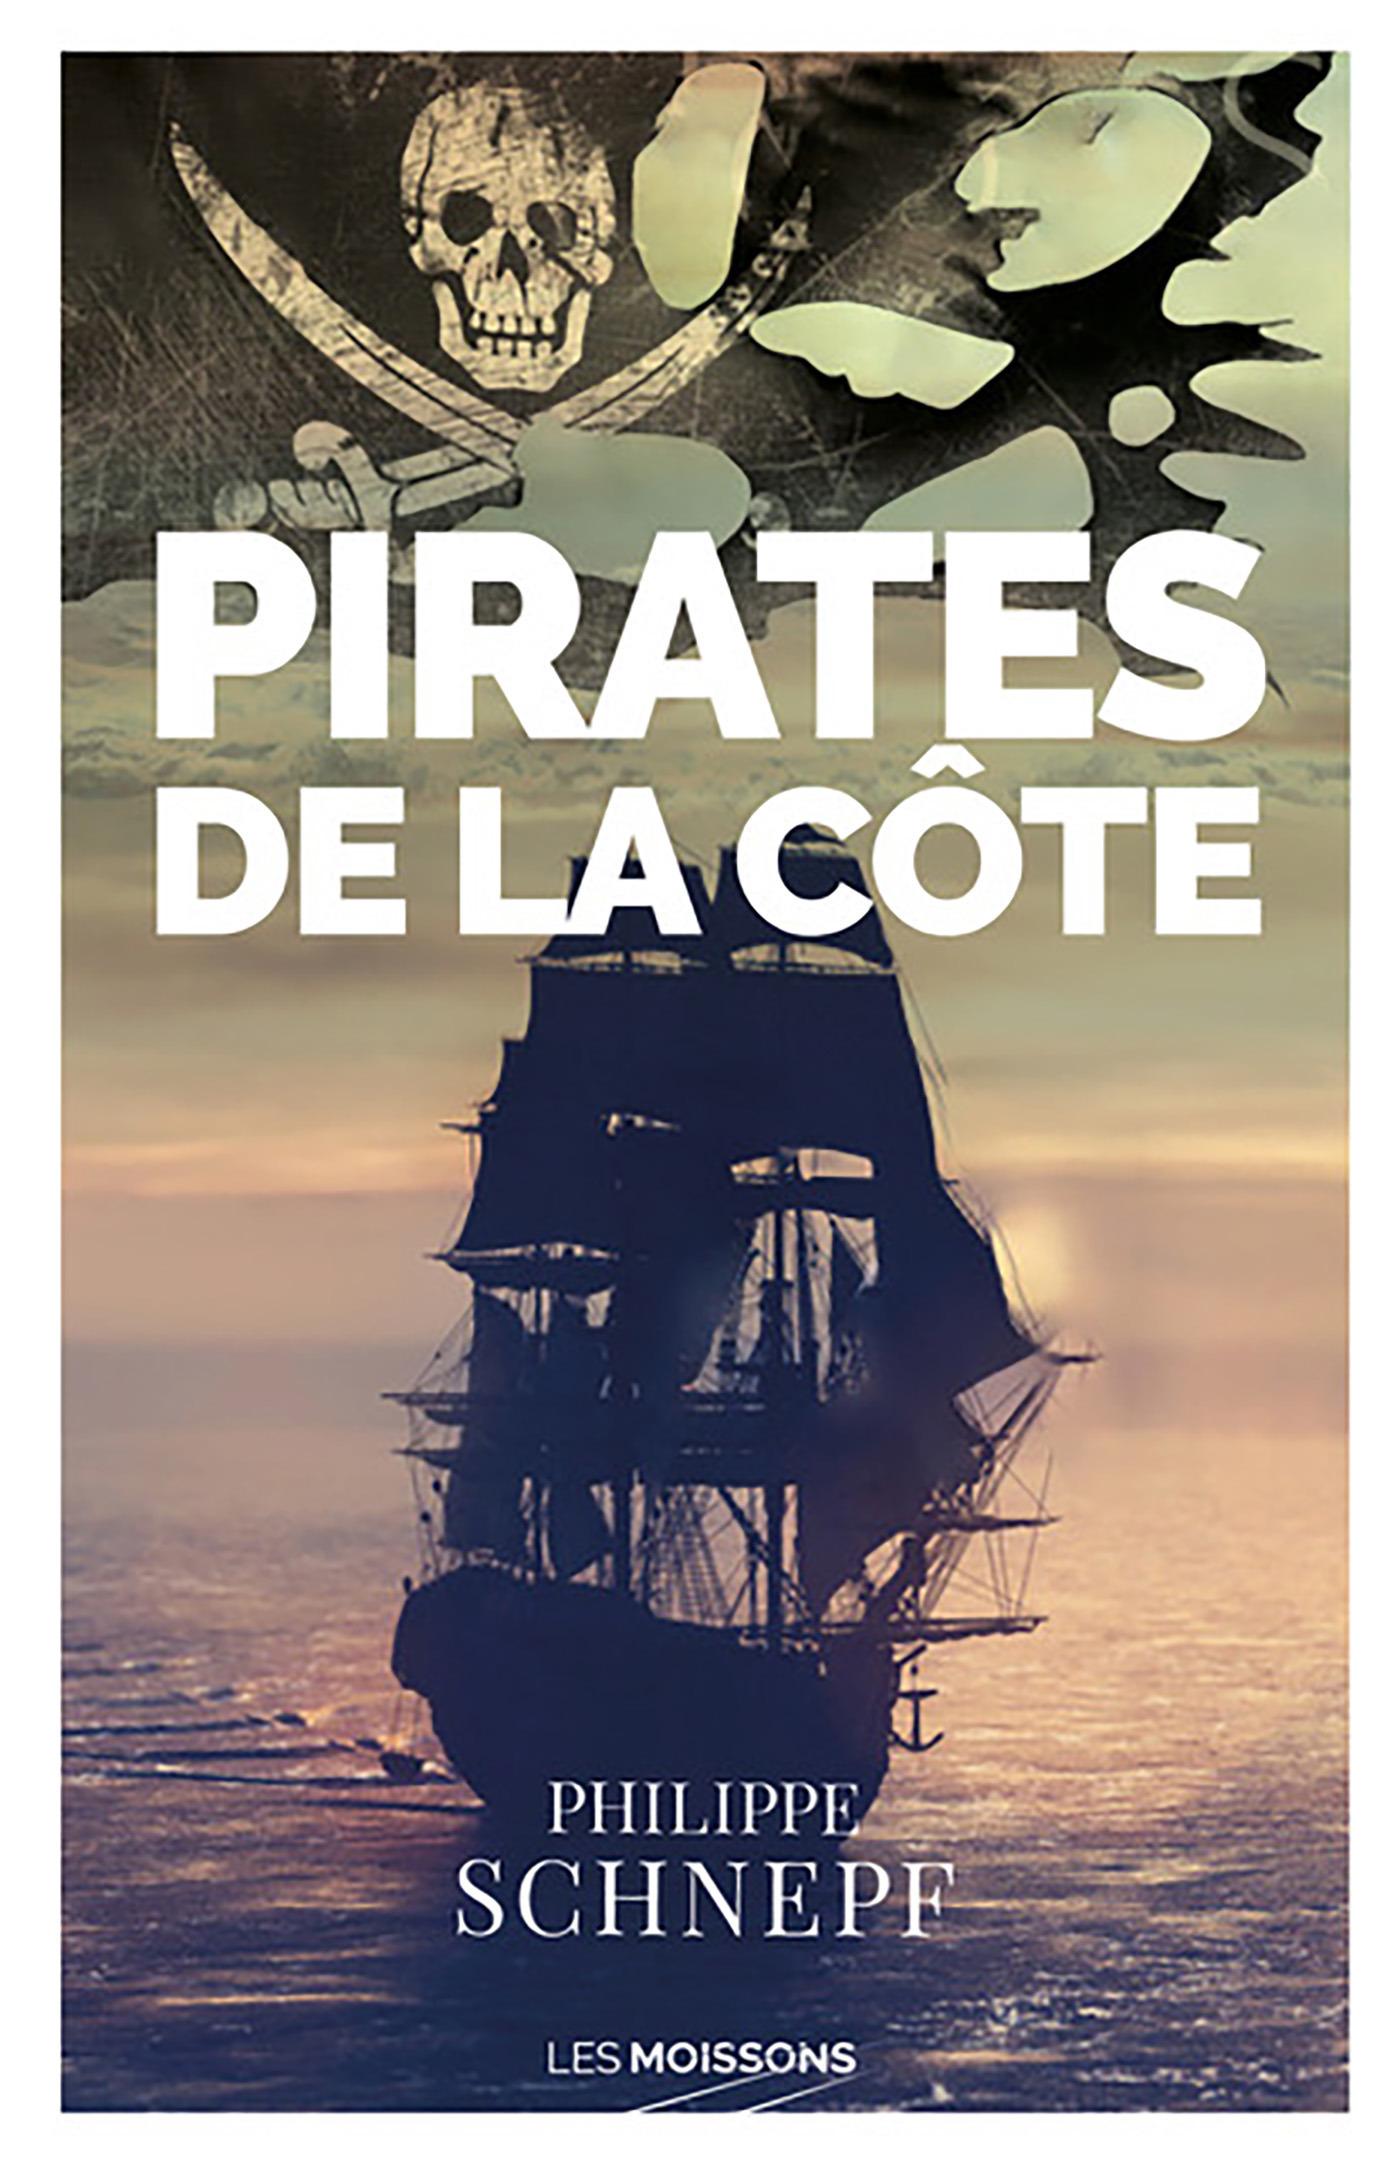 Les pirates de la cote